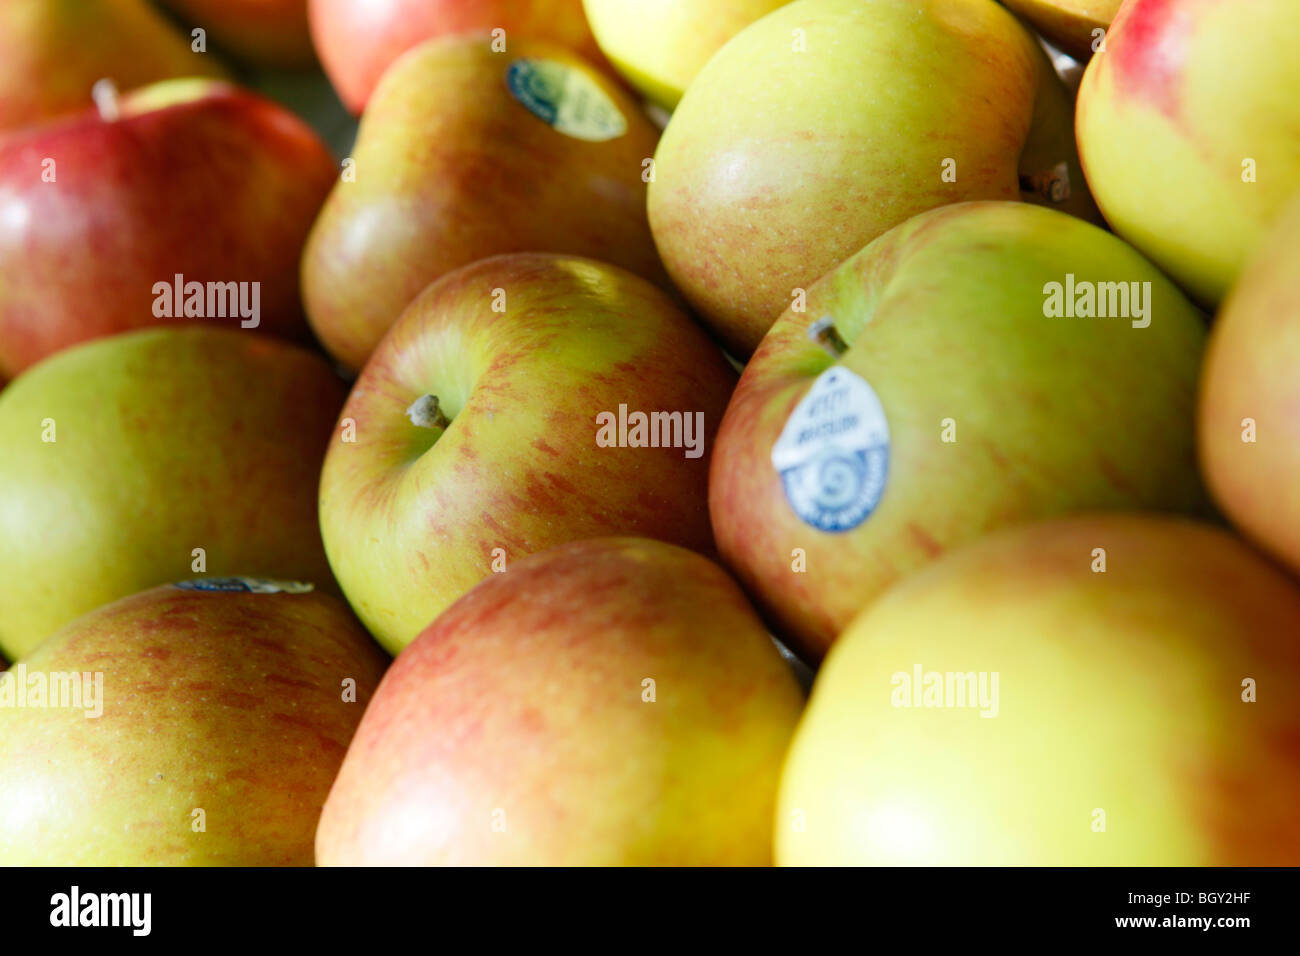 Tablett mit Äpfeln in einem Supermarkt. Stockbild